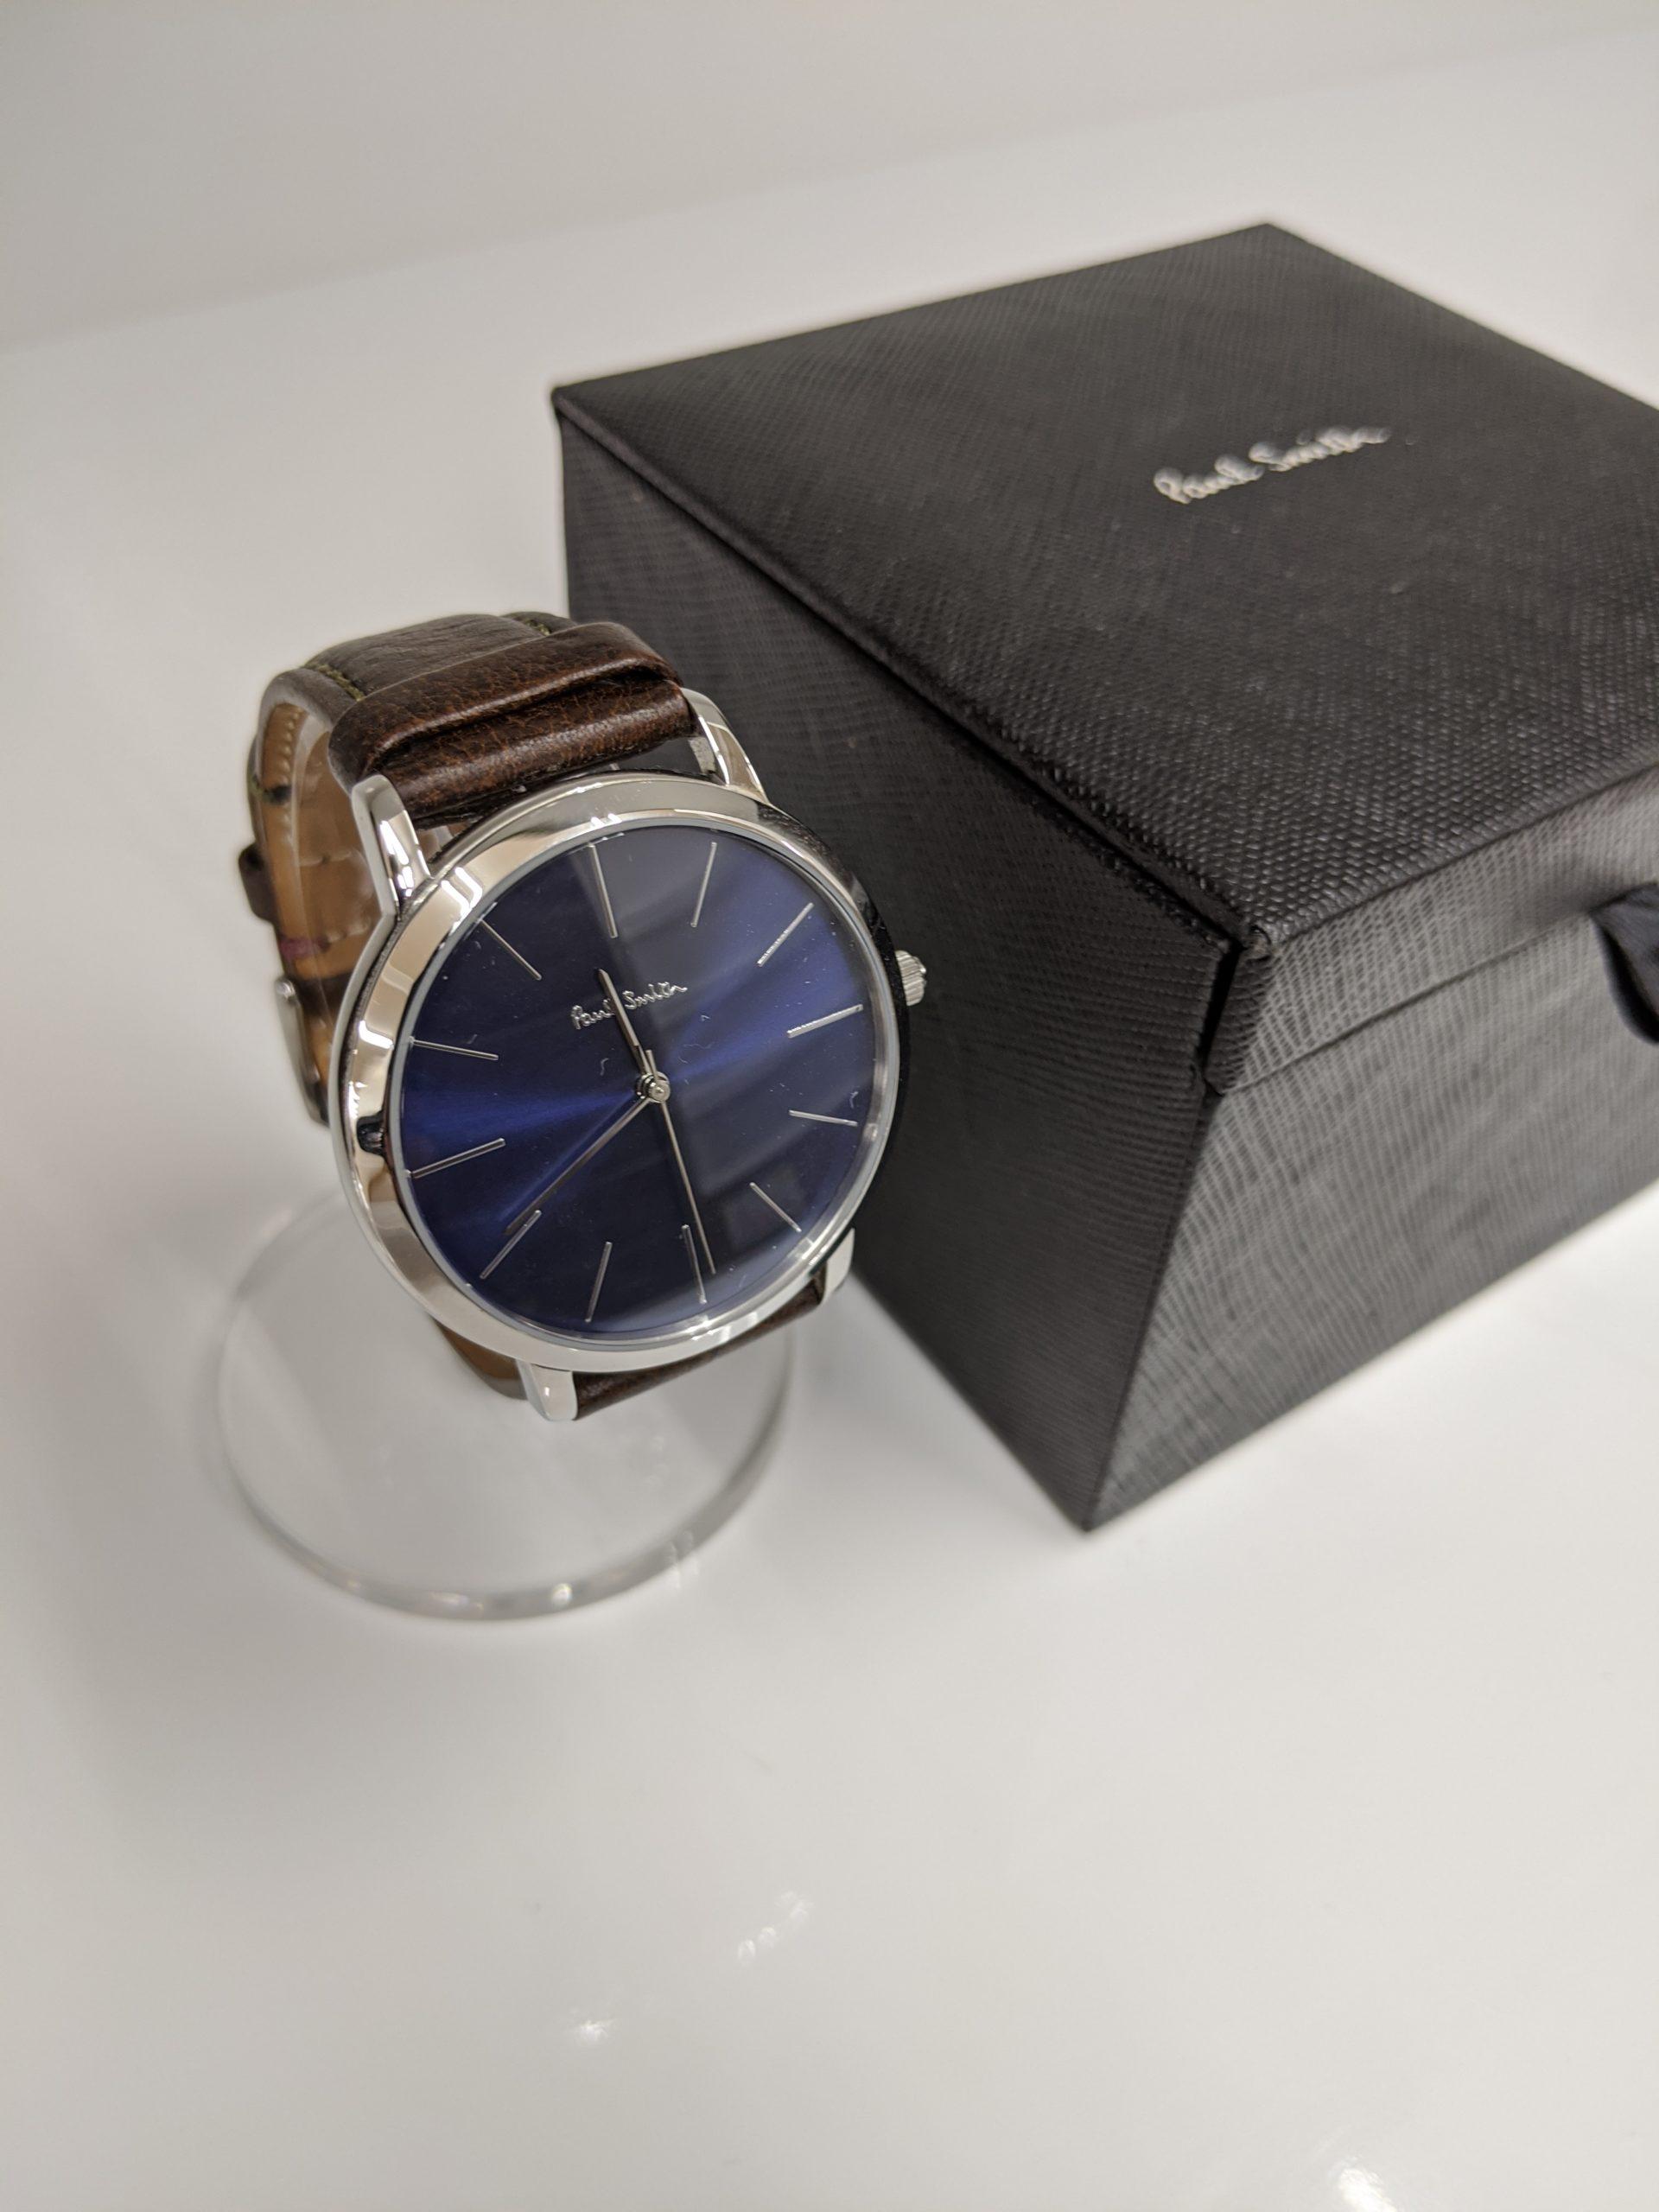 【Paul Smith ポールスミス 腕時計 ブランド品】買い取り致しました!の買取-